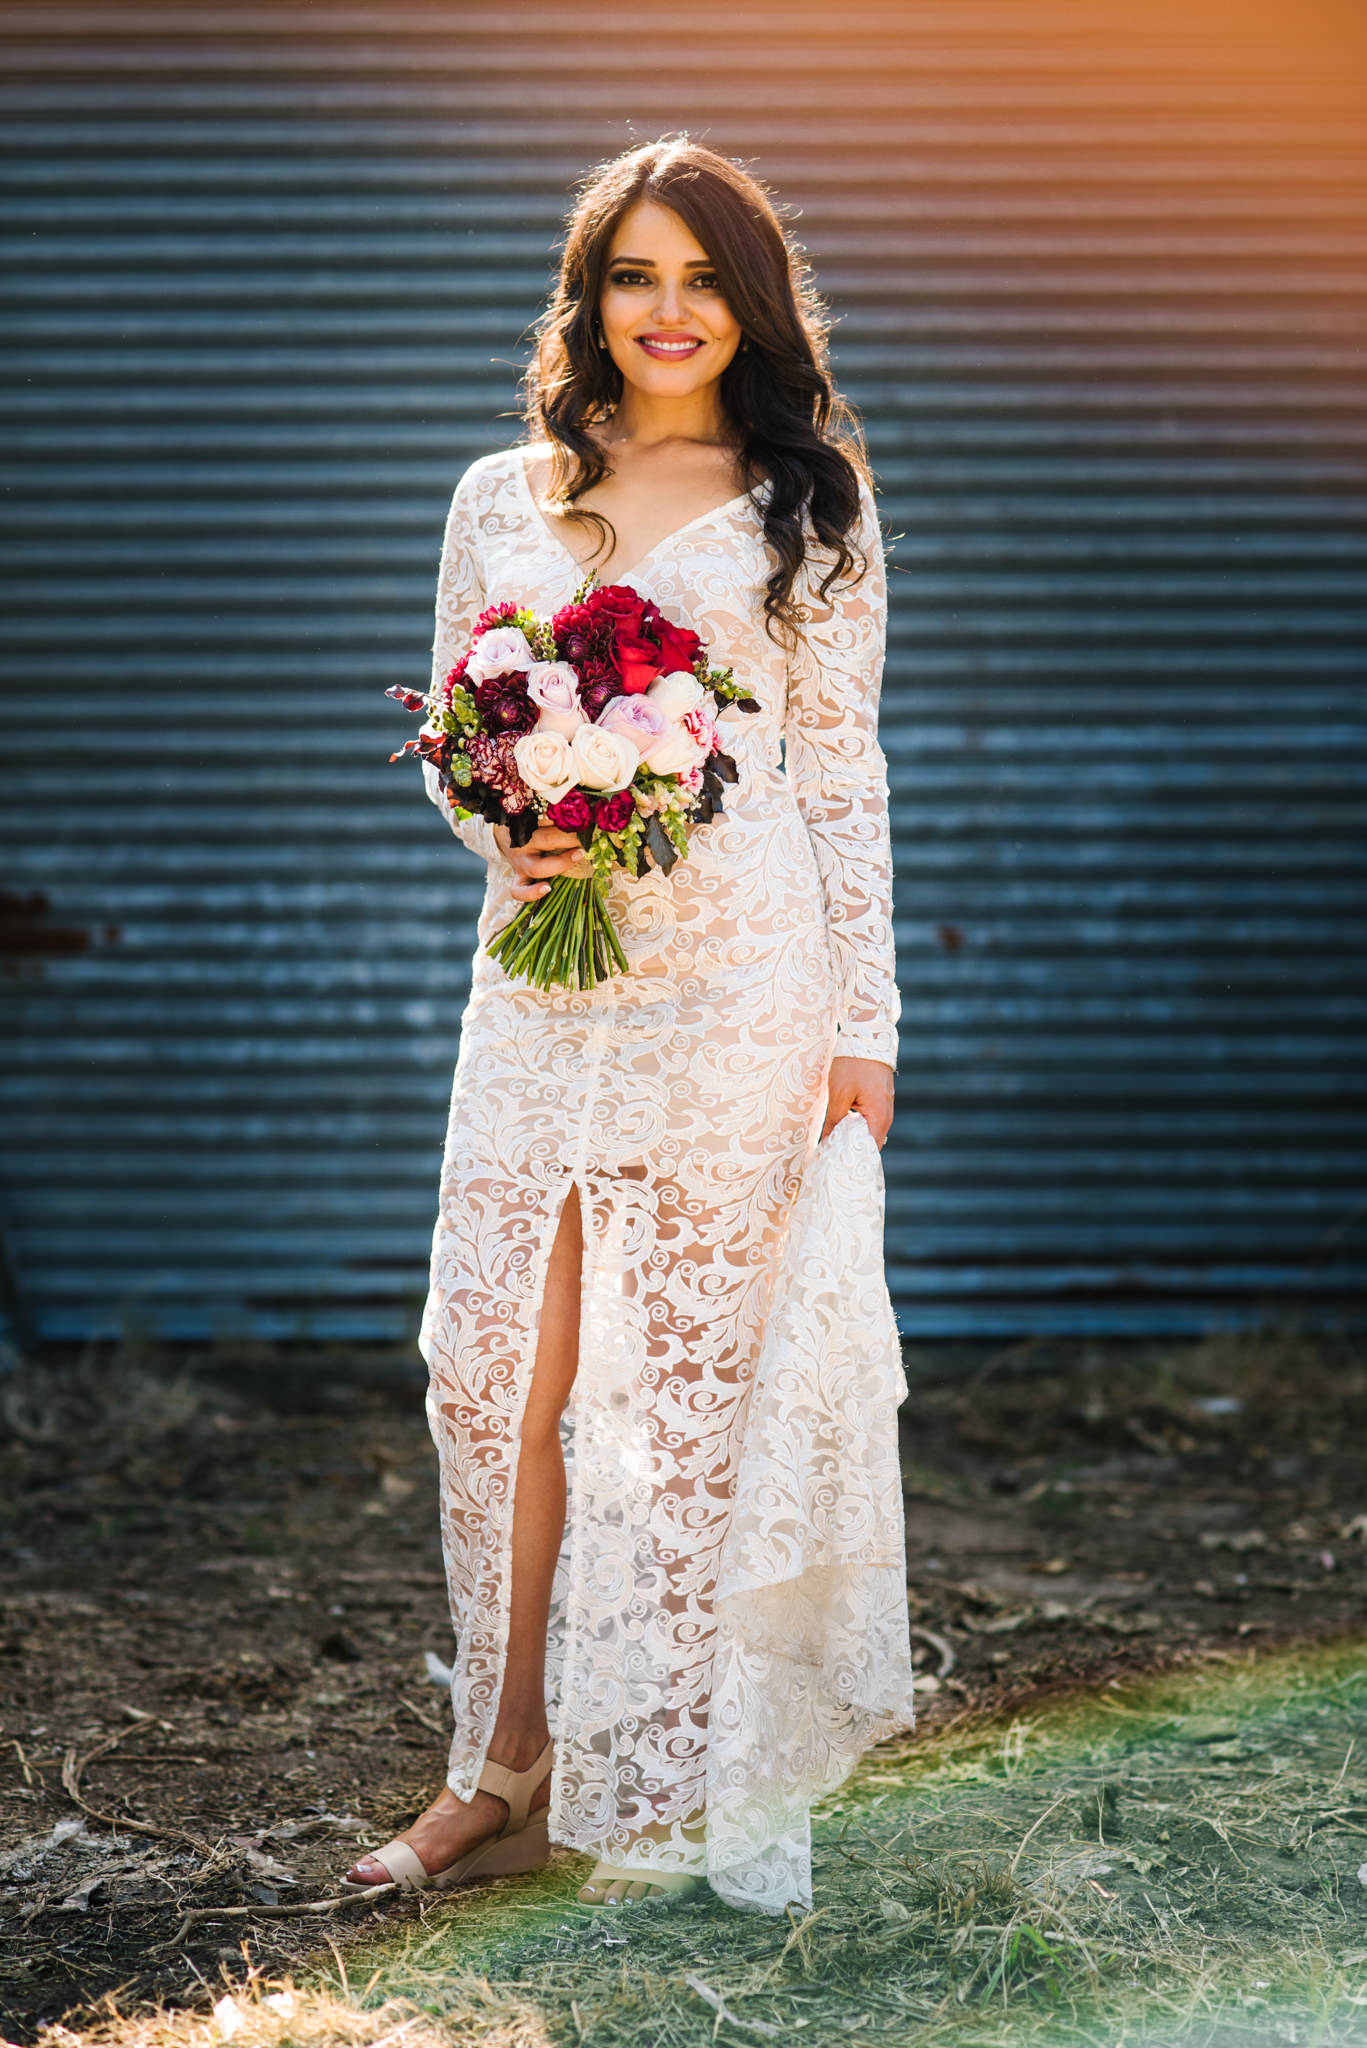 Vintage bridal gown at country wedding.jpg